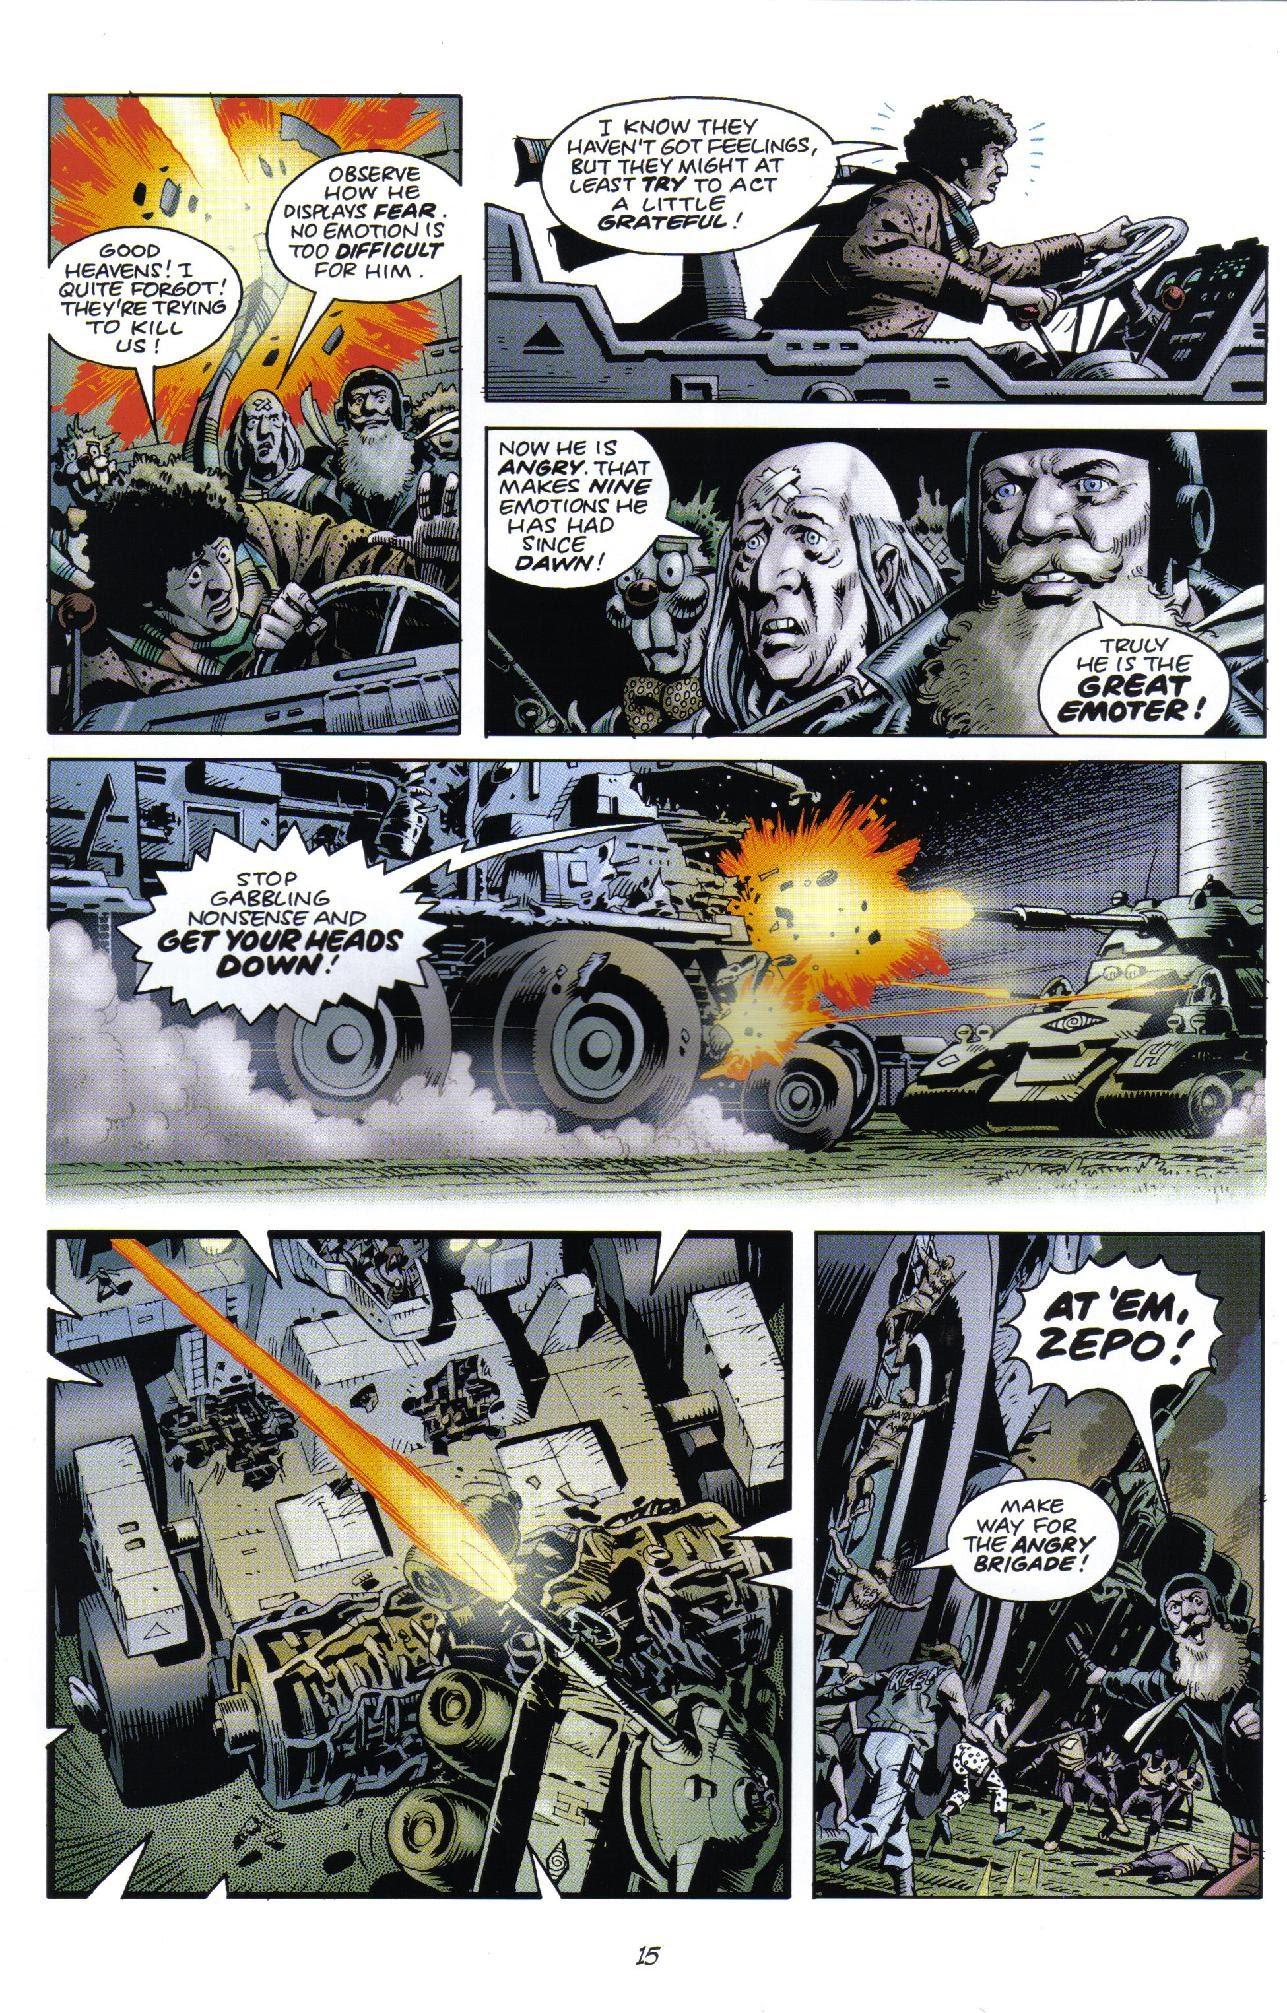 Doctor Who Classics Issue 3   Viewcomic reading comics